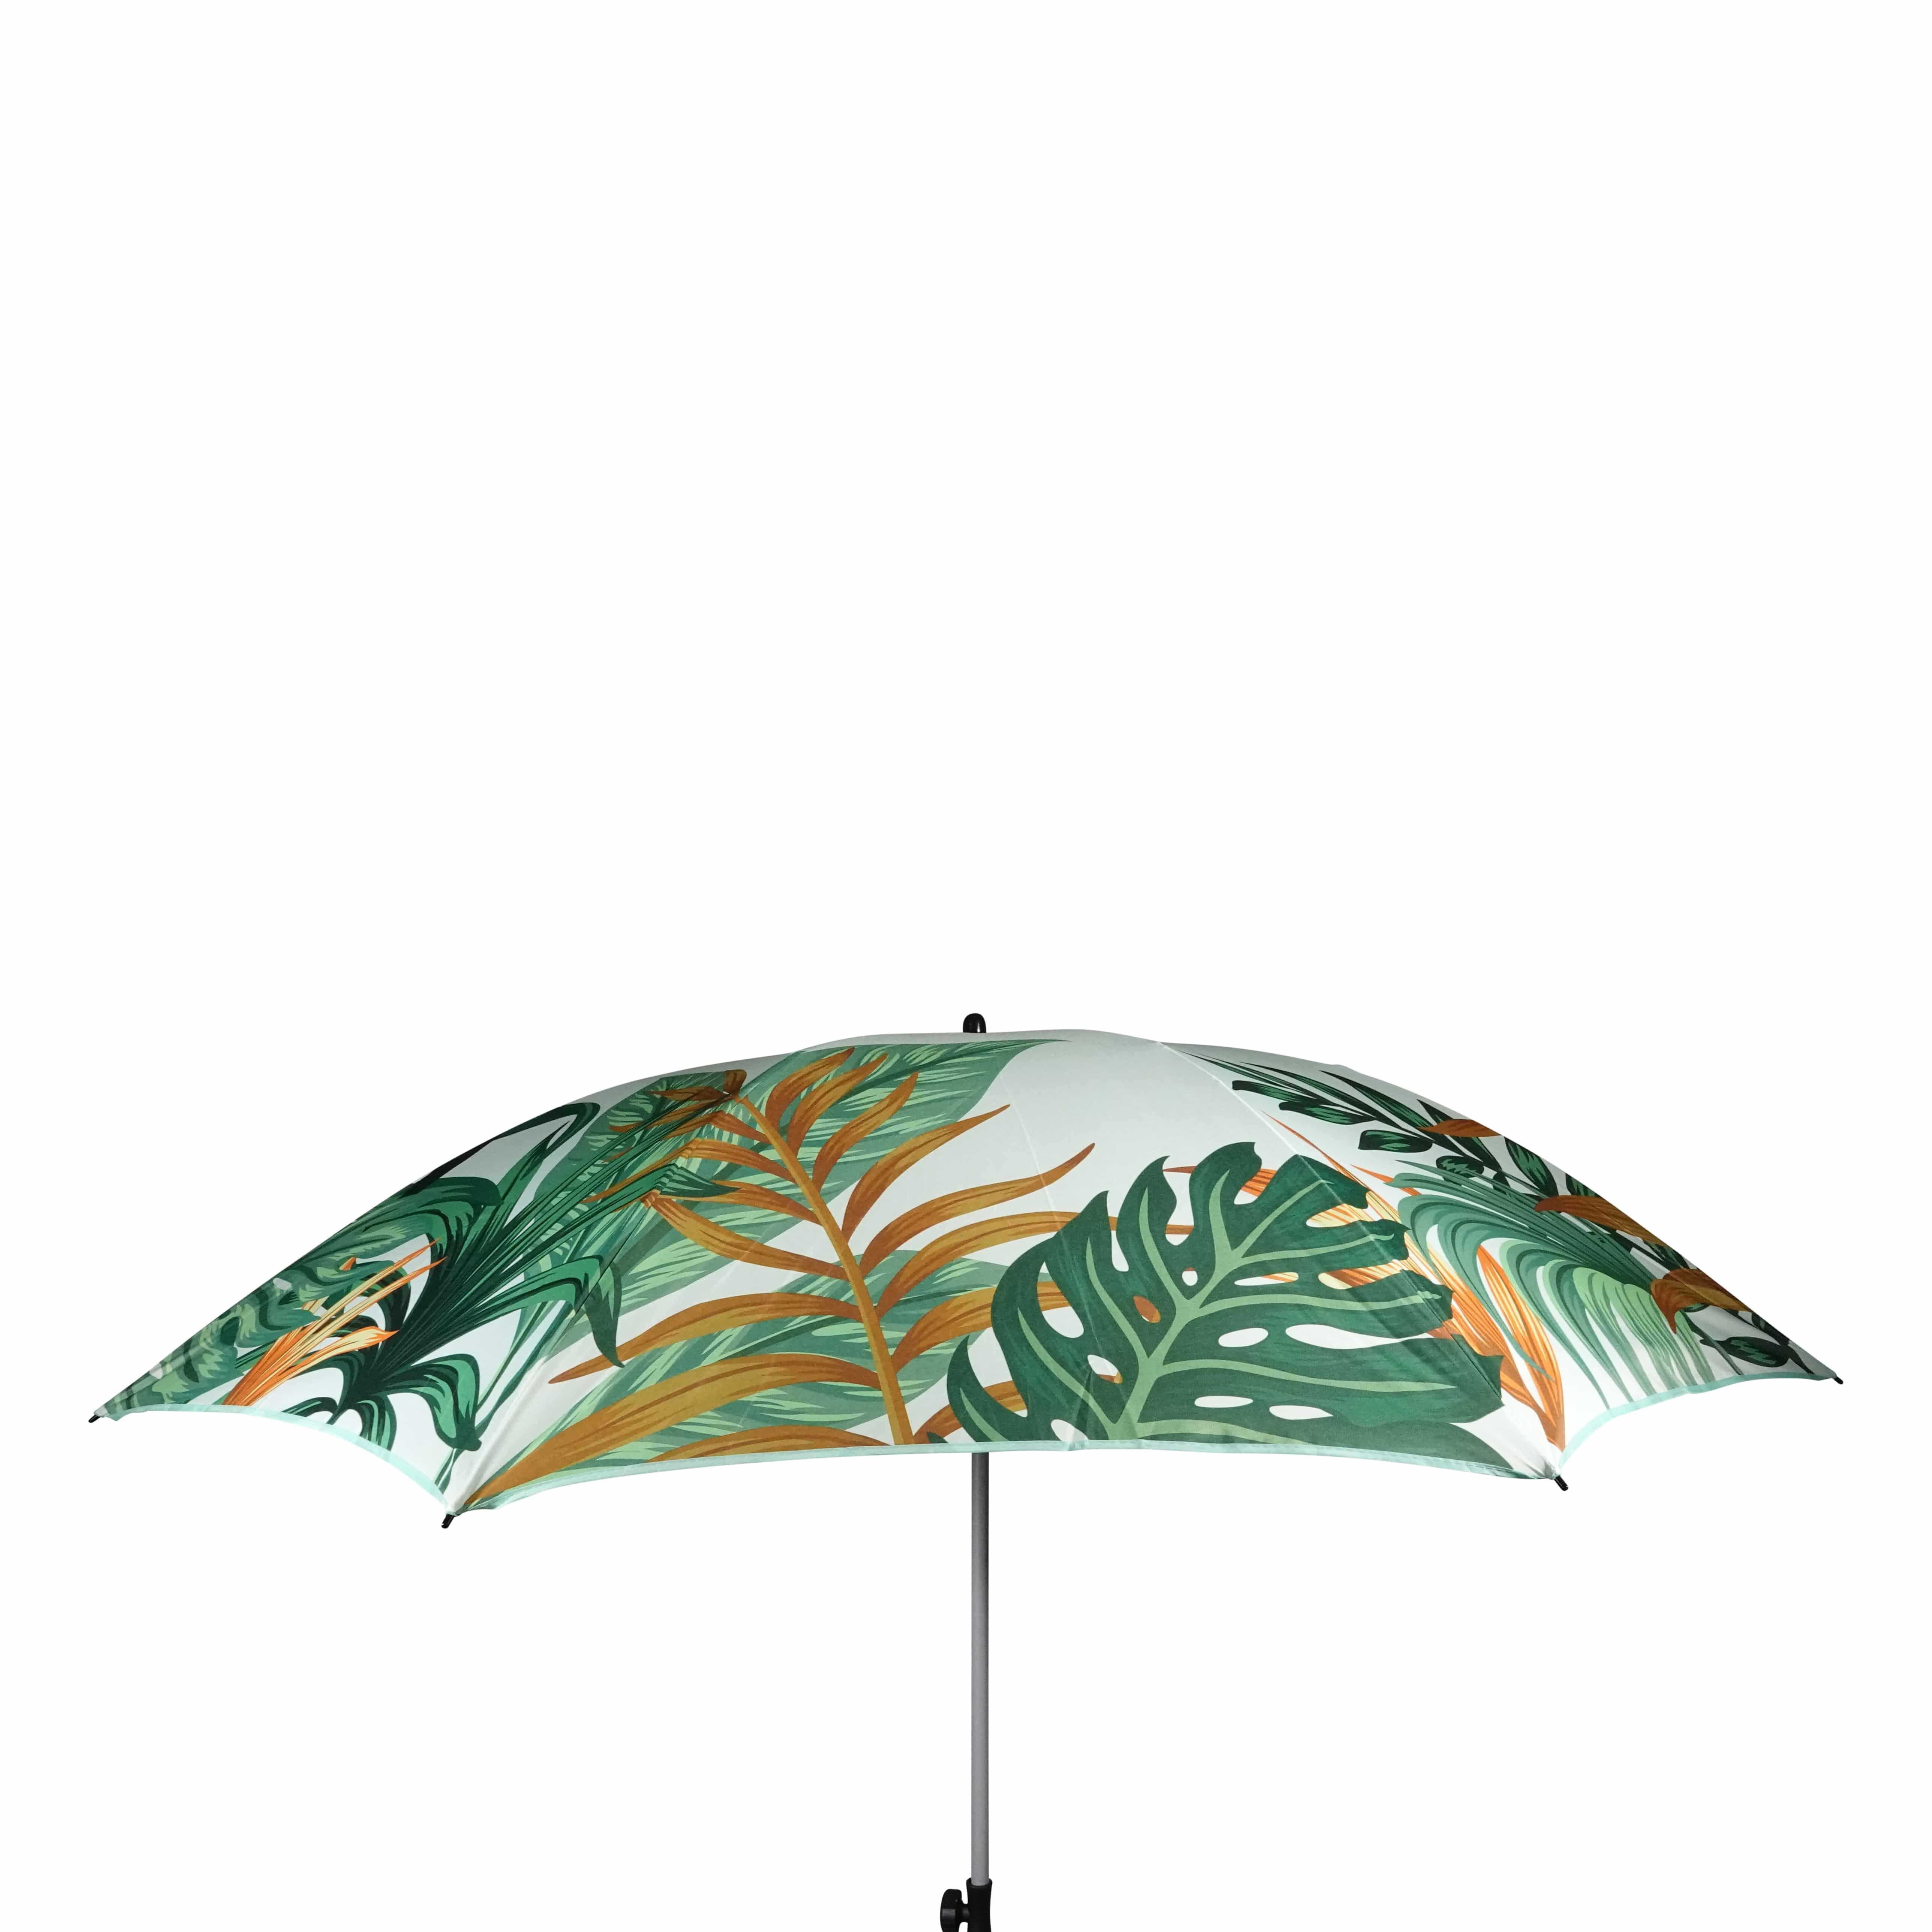 4gardenz Tropical strandparasol met knikarm 200 cm - Olijfgroen